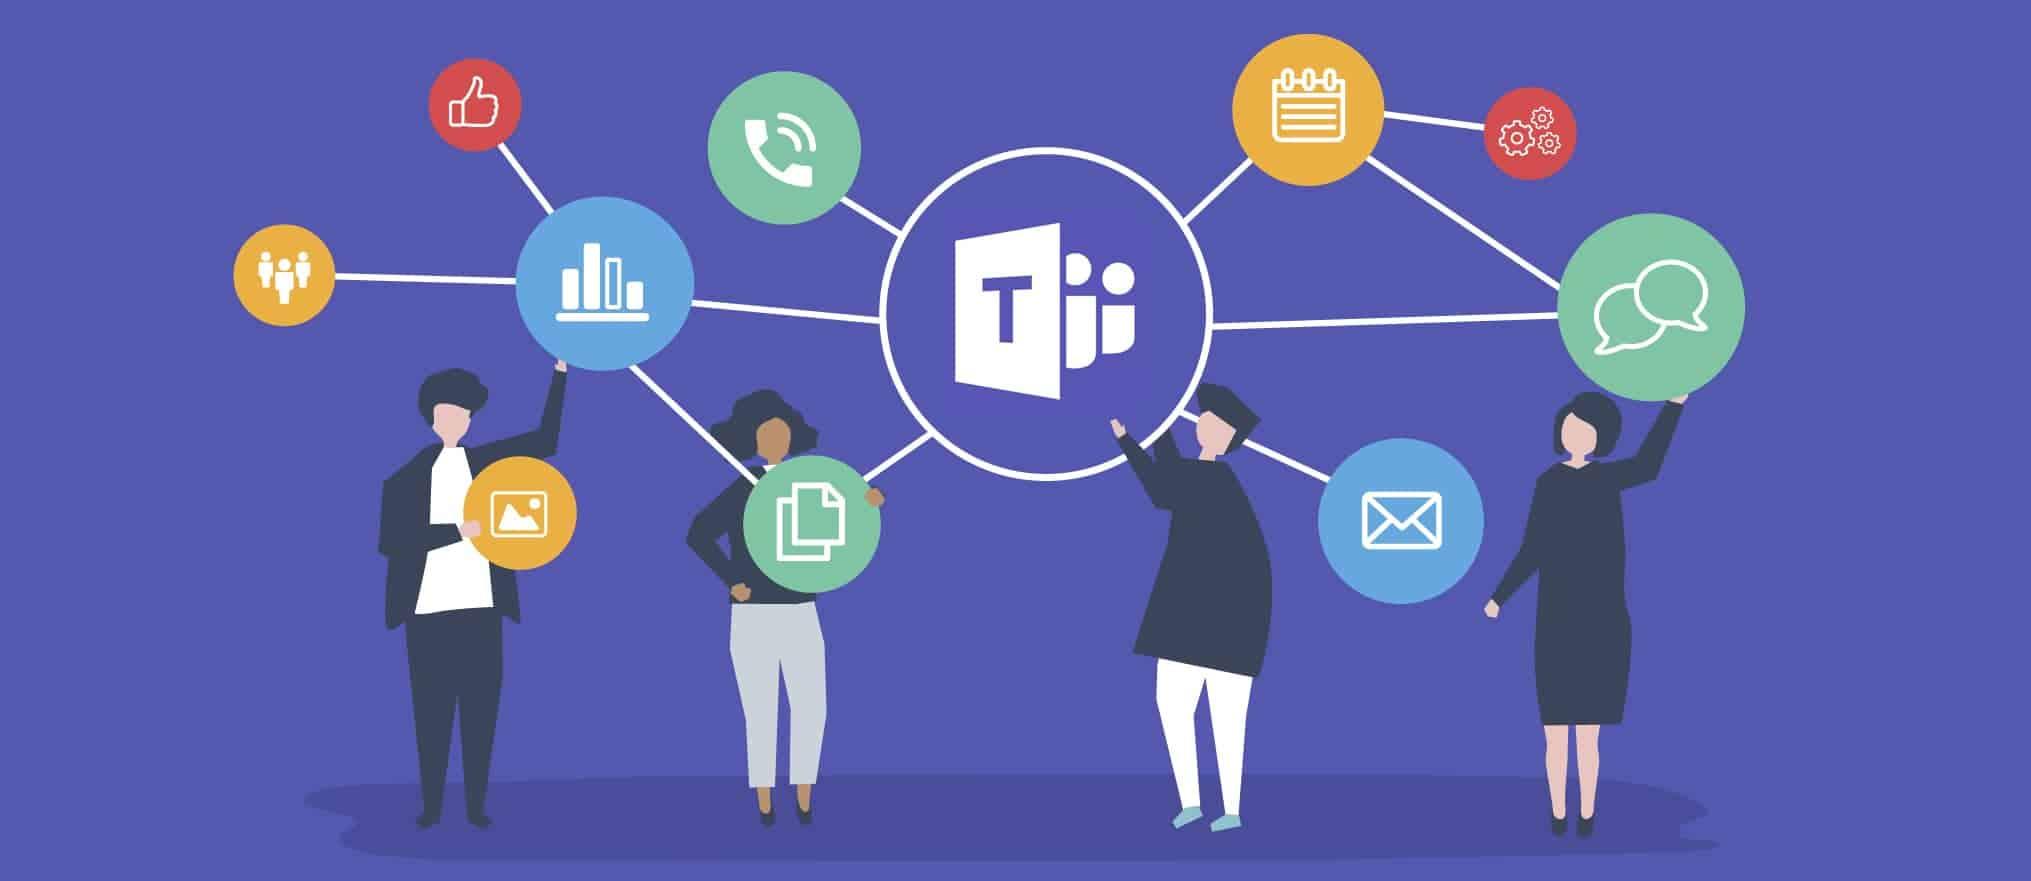 Microsoft Teams for Education - Formazione informatica, Microsoft Teams - Nexsys